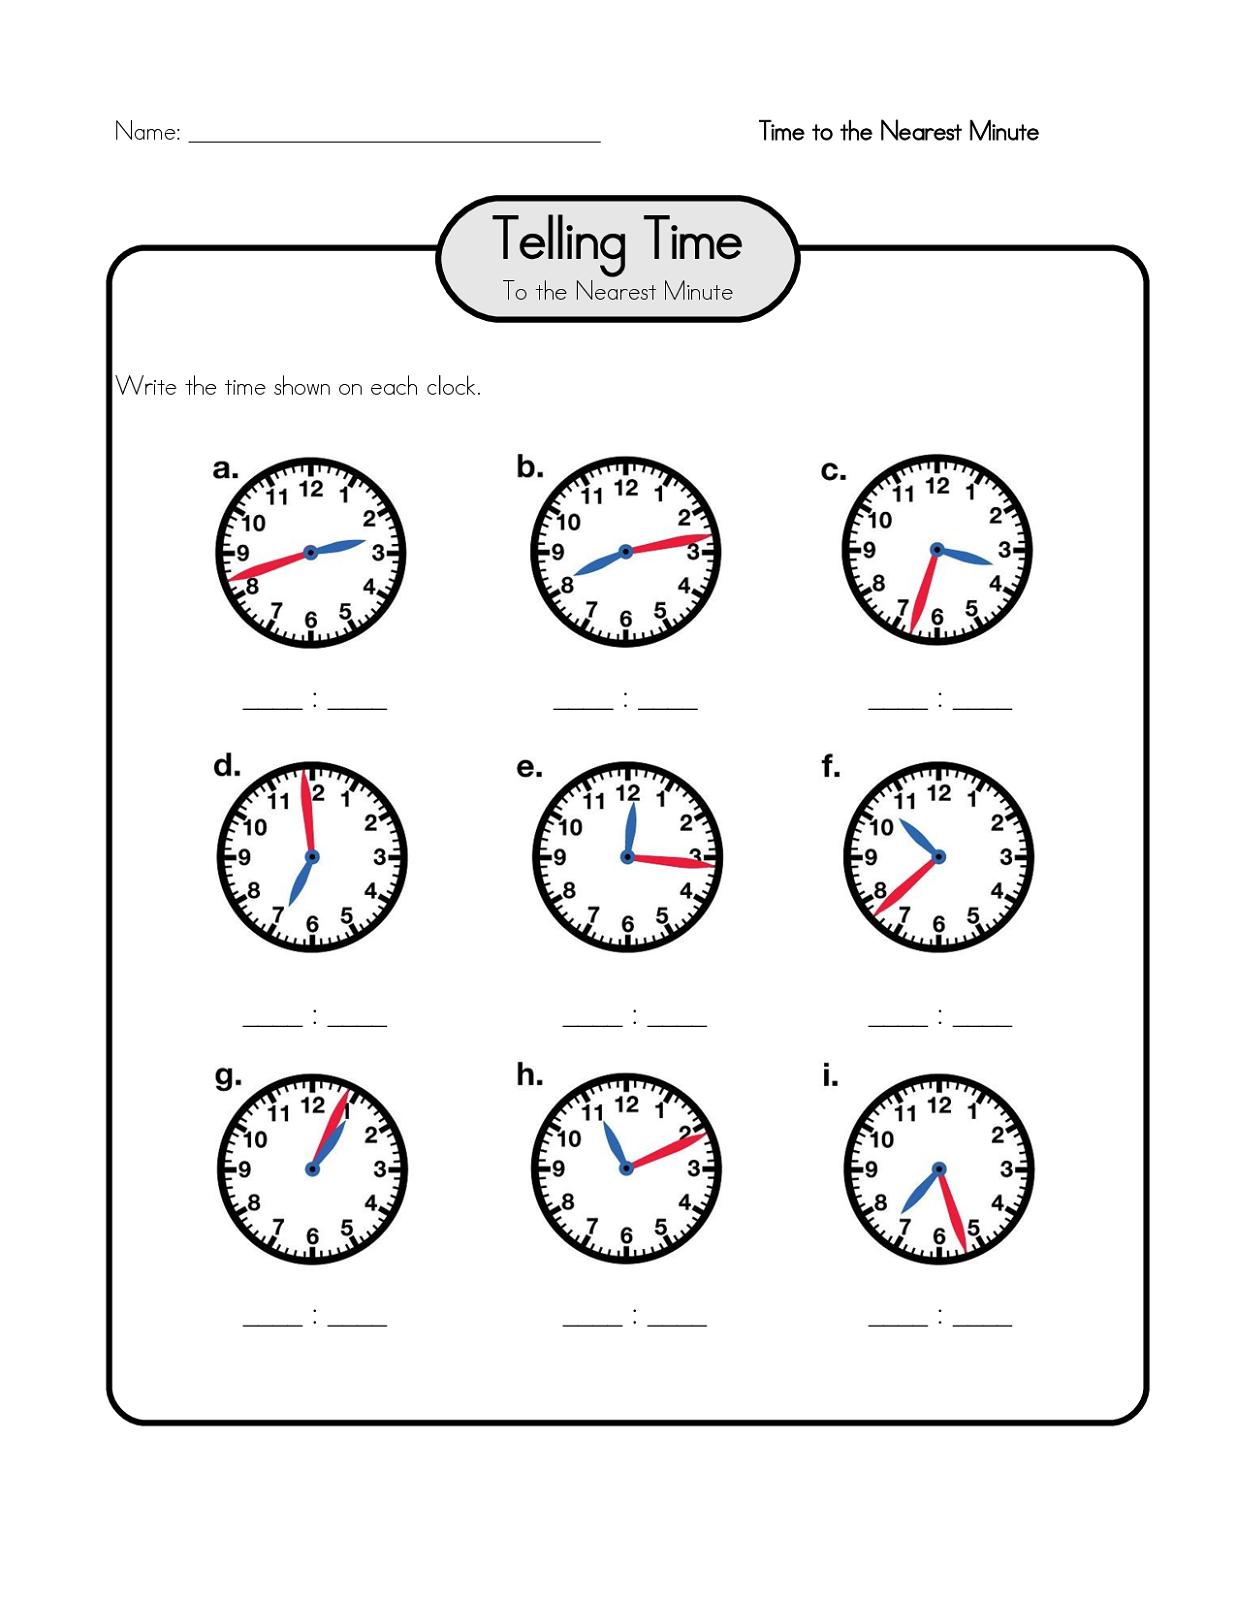 free elapsed time worksheet for school